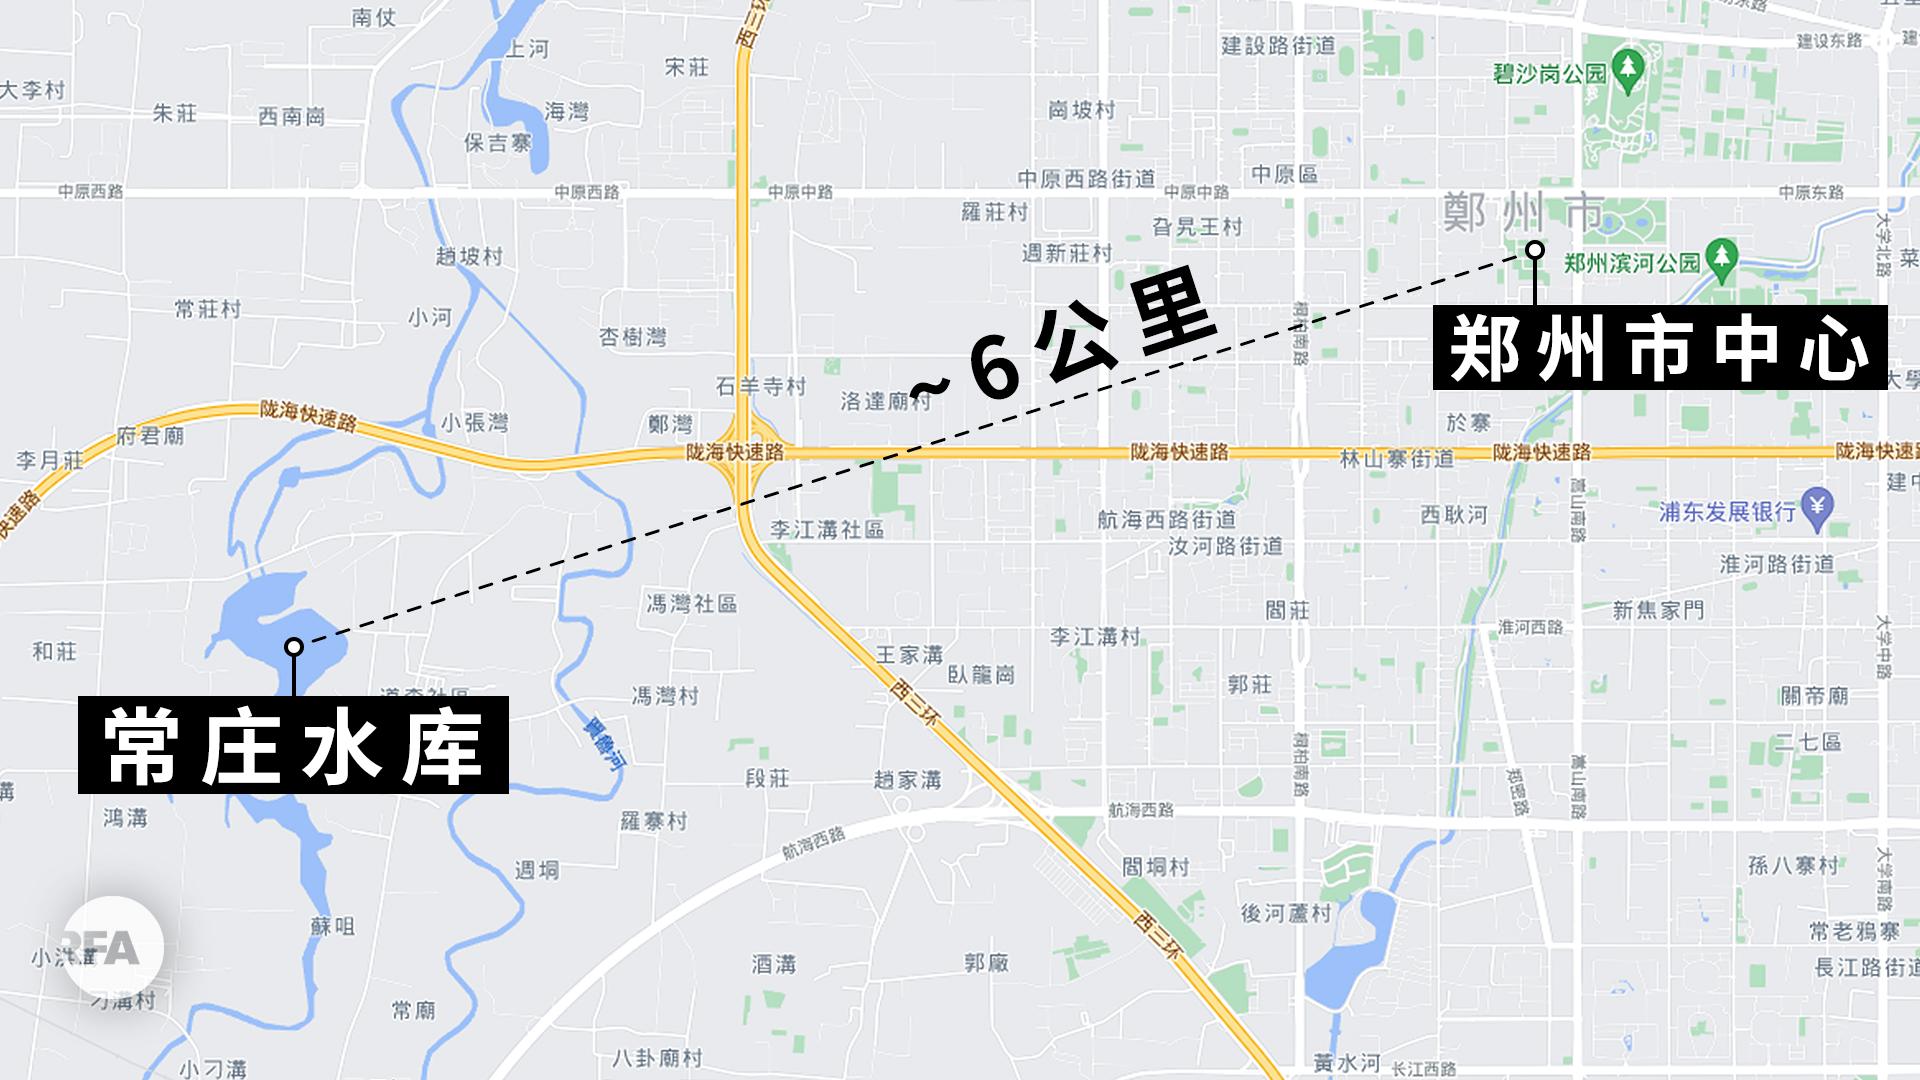 zhengzhou map_banner_mand.jpg